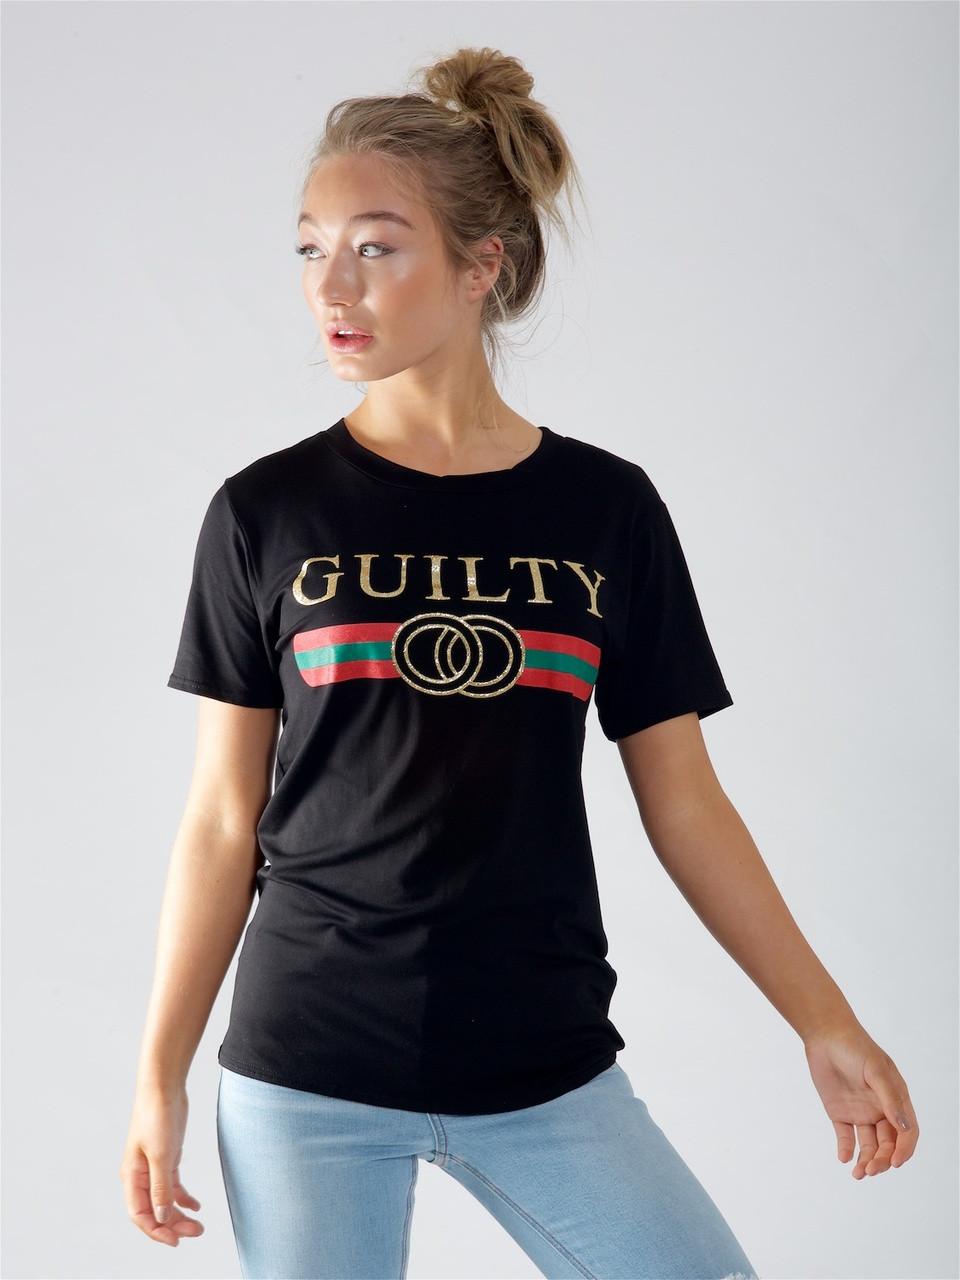 Black Guilty Slogan Tee